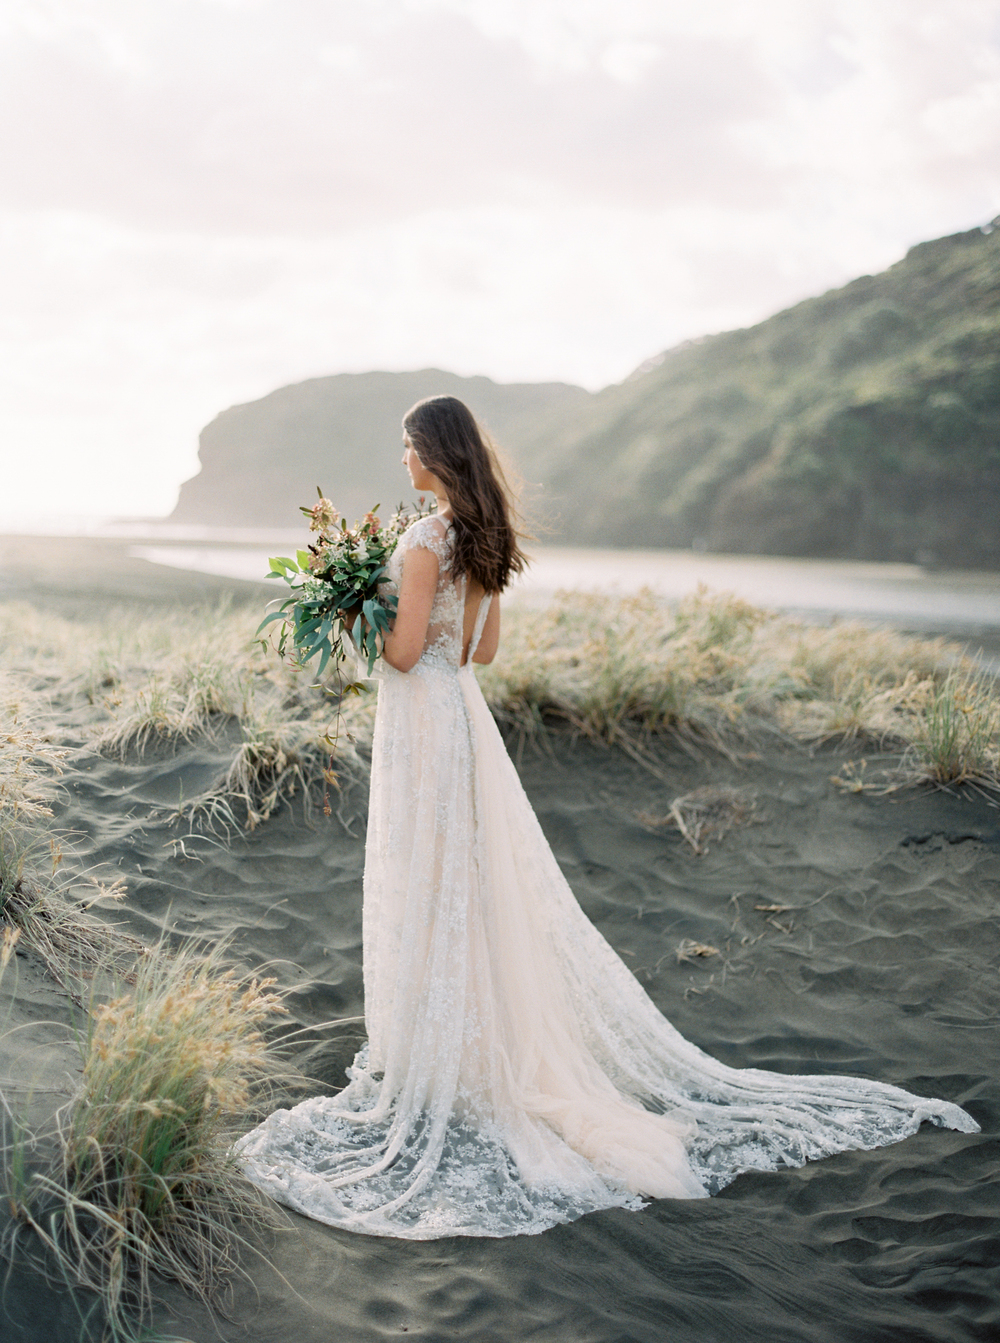 reid_lambshead_when_he_found_her_bethells_beach_auckland_new_zealand_magnolia_rouge_shop_gossamer_photovisionprints.jpg